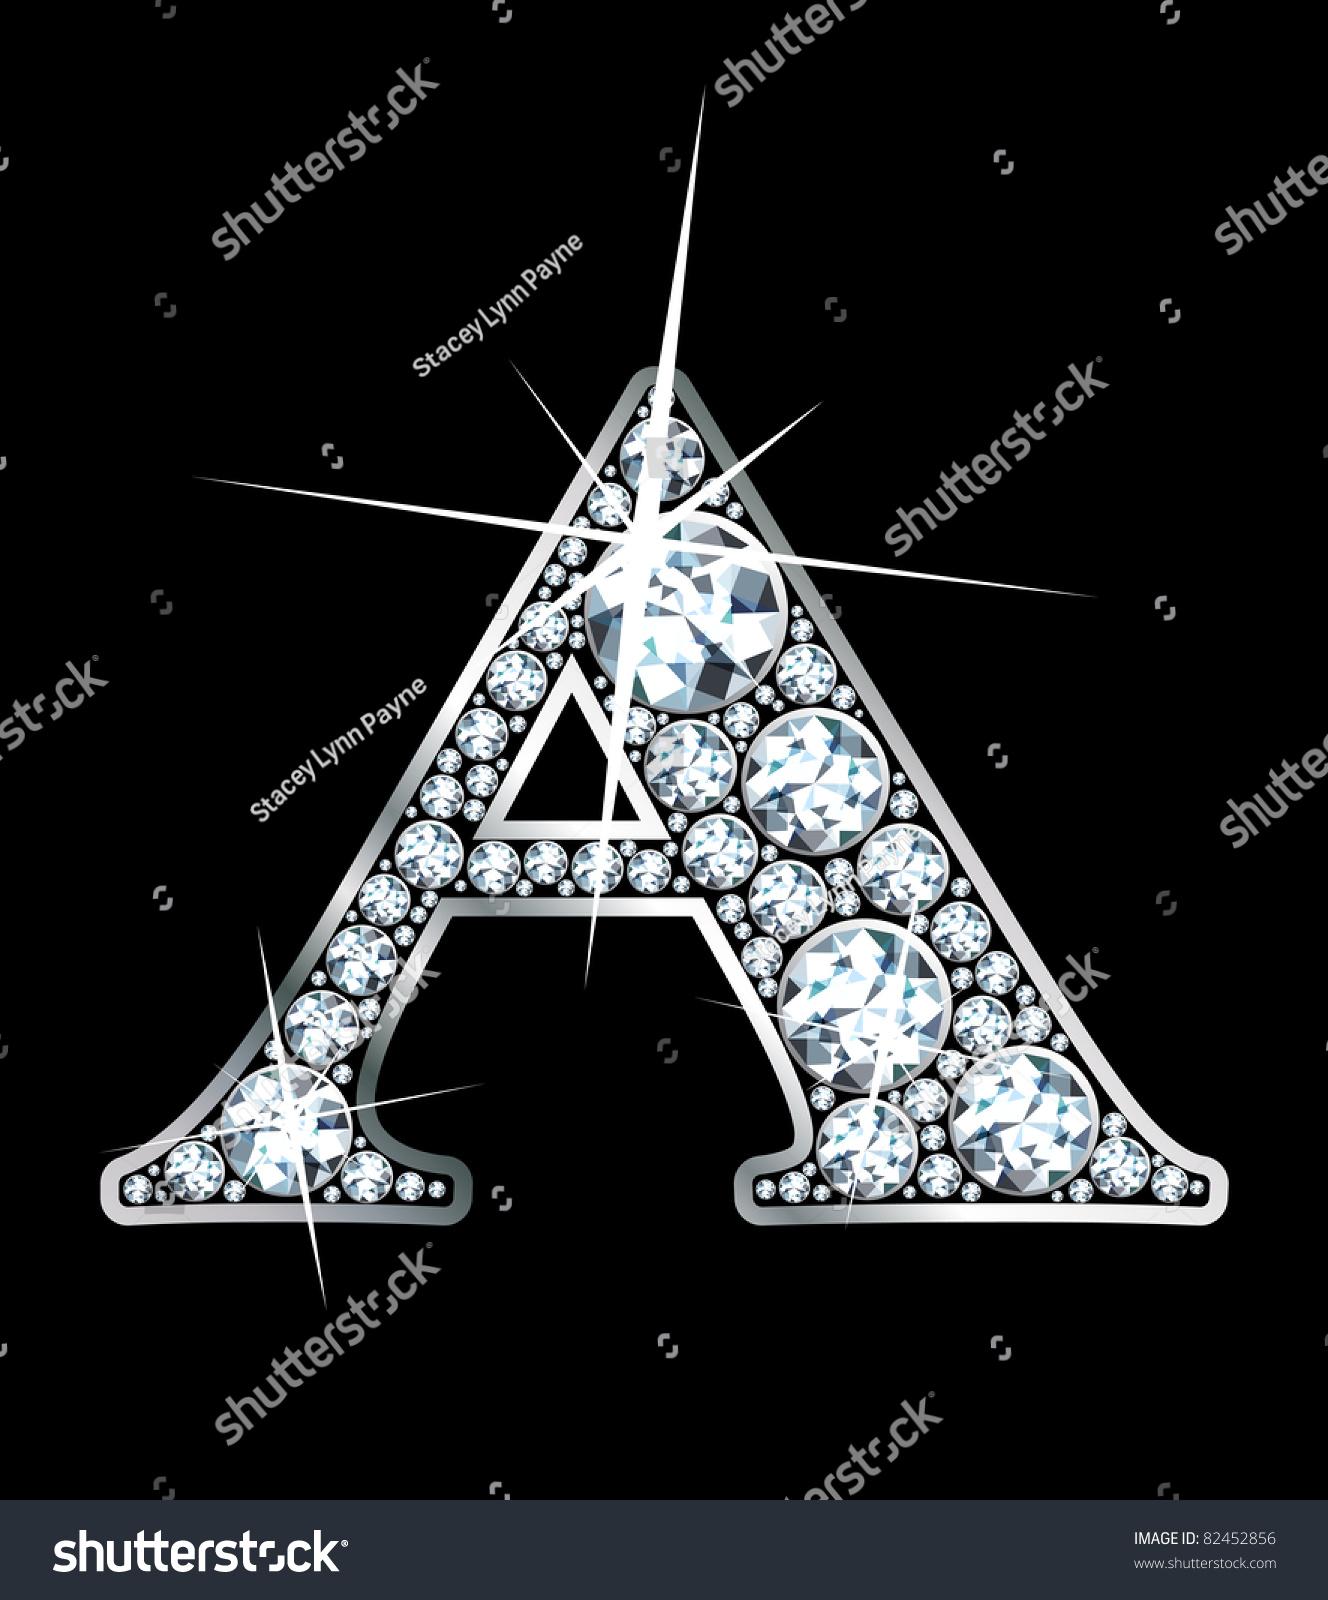 Stunning Beautiful A Set Diamonds Silver Stock Vector 82452856 ...